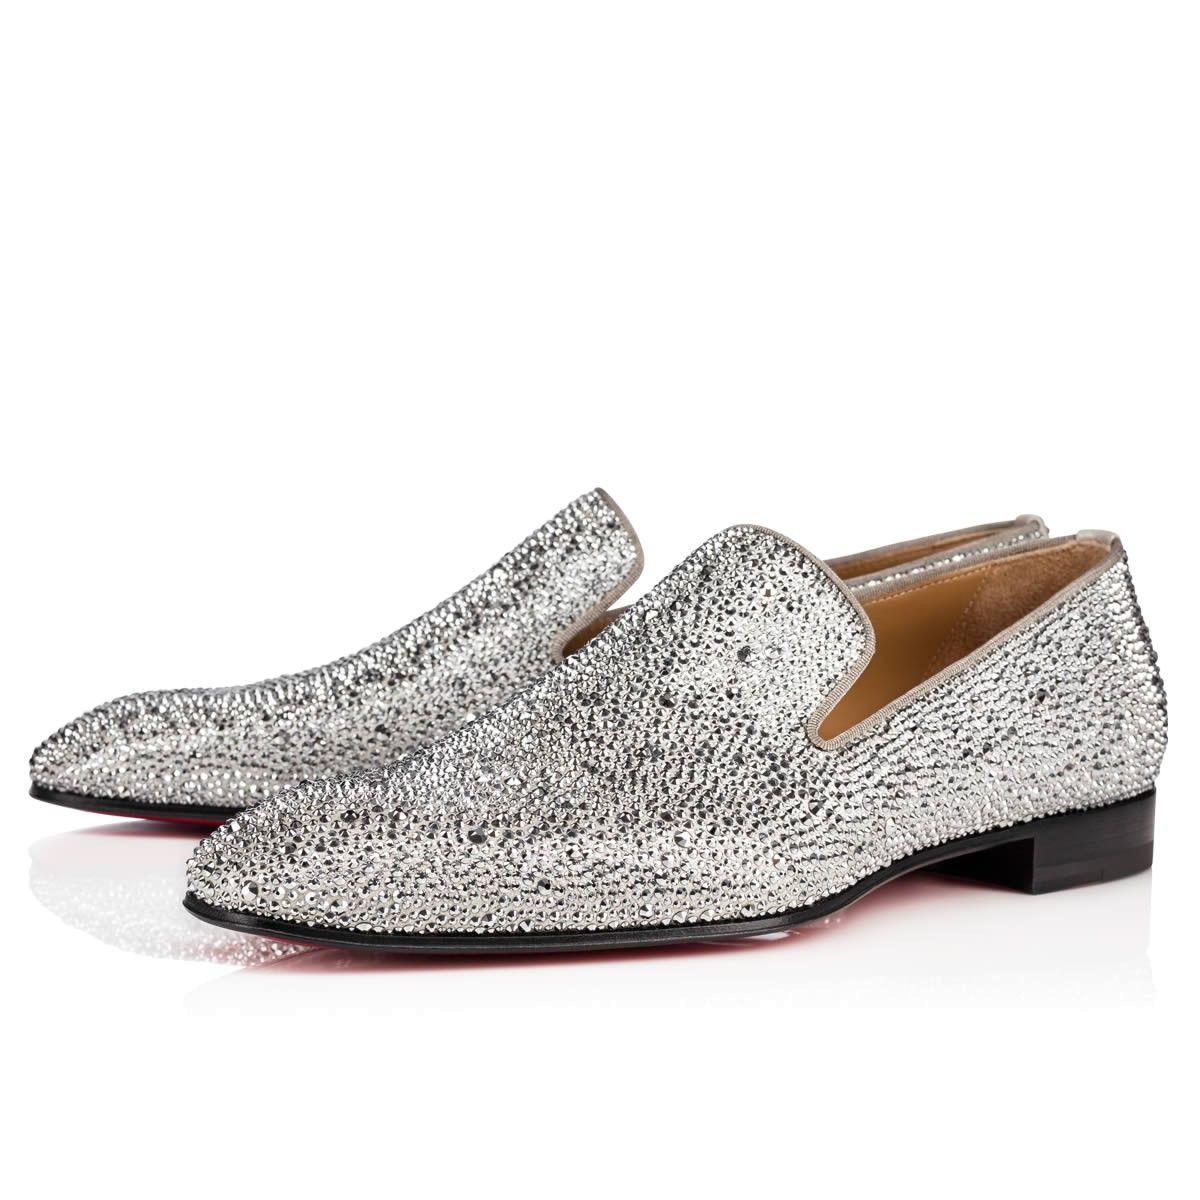 398823506023 CHRISTIAN LOUBOUTIN Dandelion Strass Flat Suede Burma Gg Version Silver  Strass - Men Shoes - Christian Louboutin.  christianlouboutin  shoes